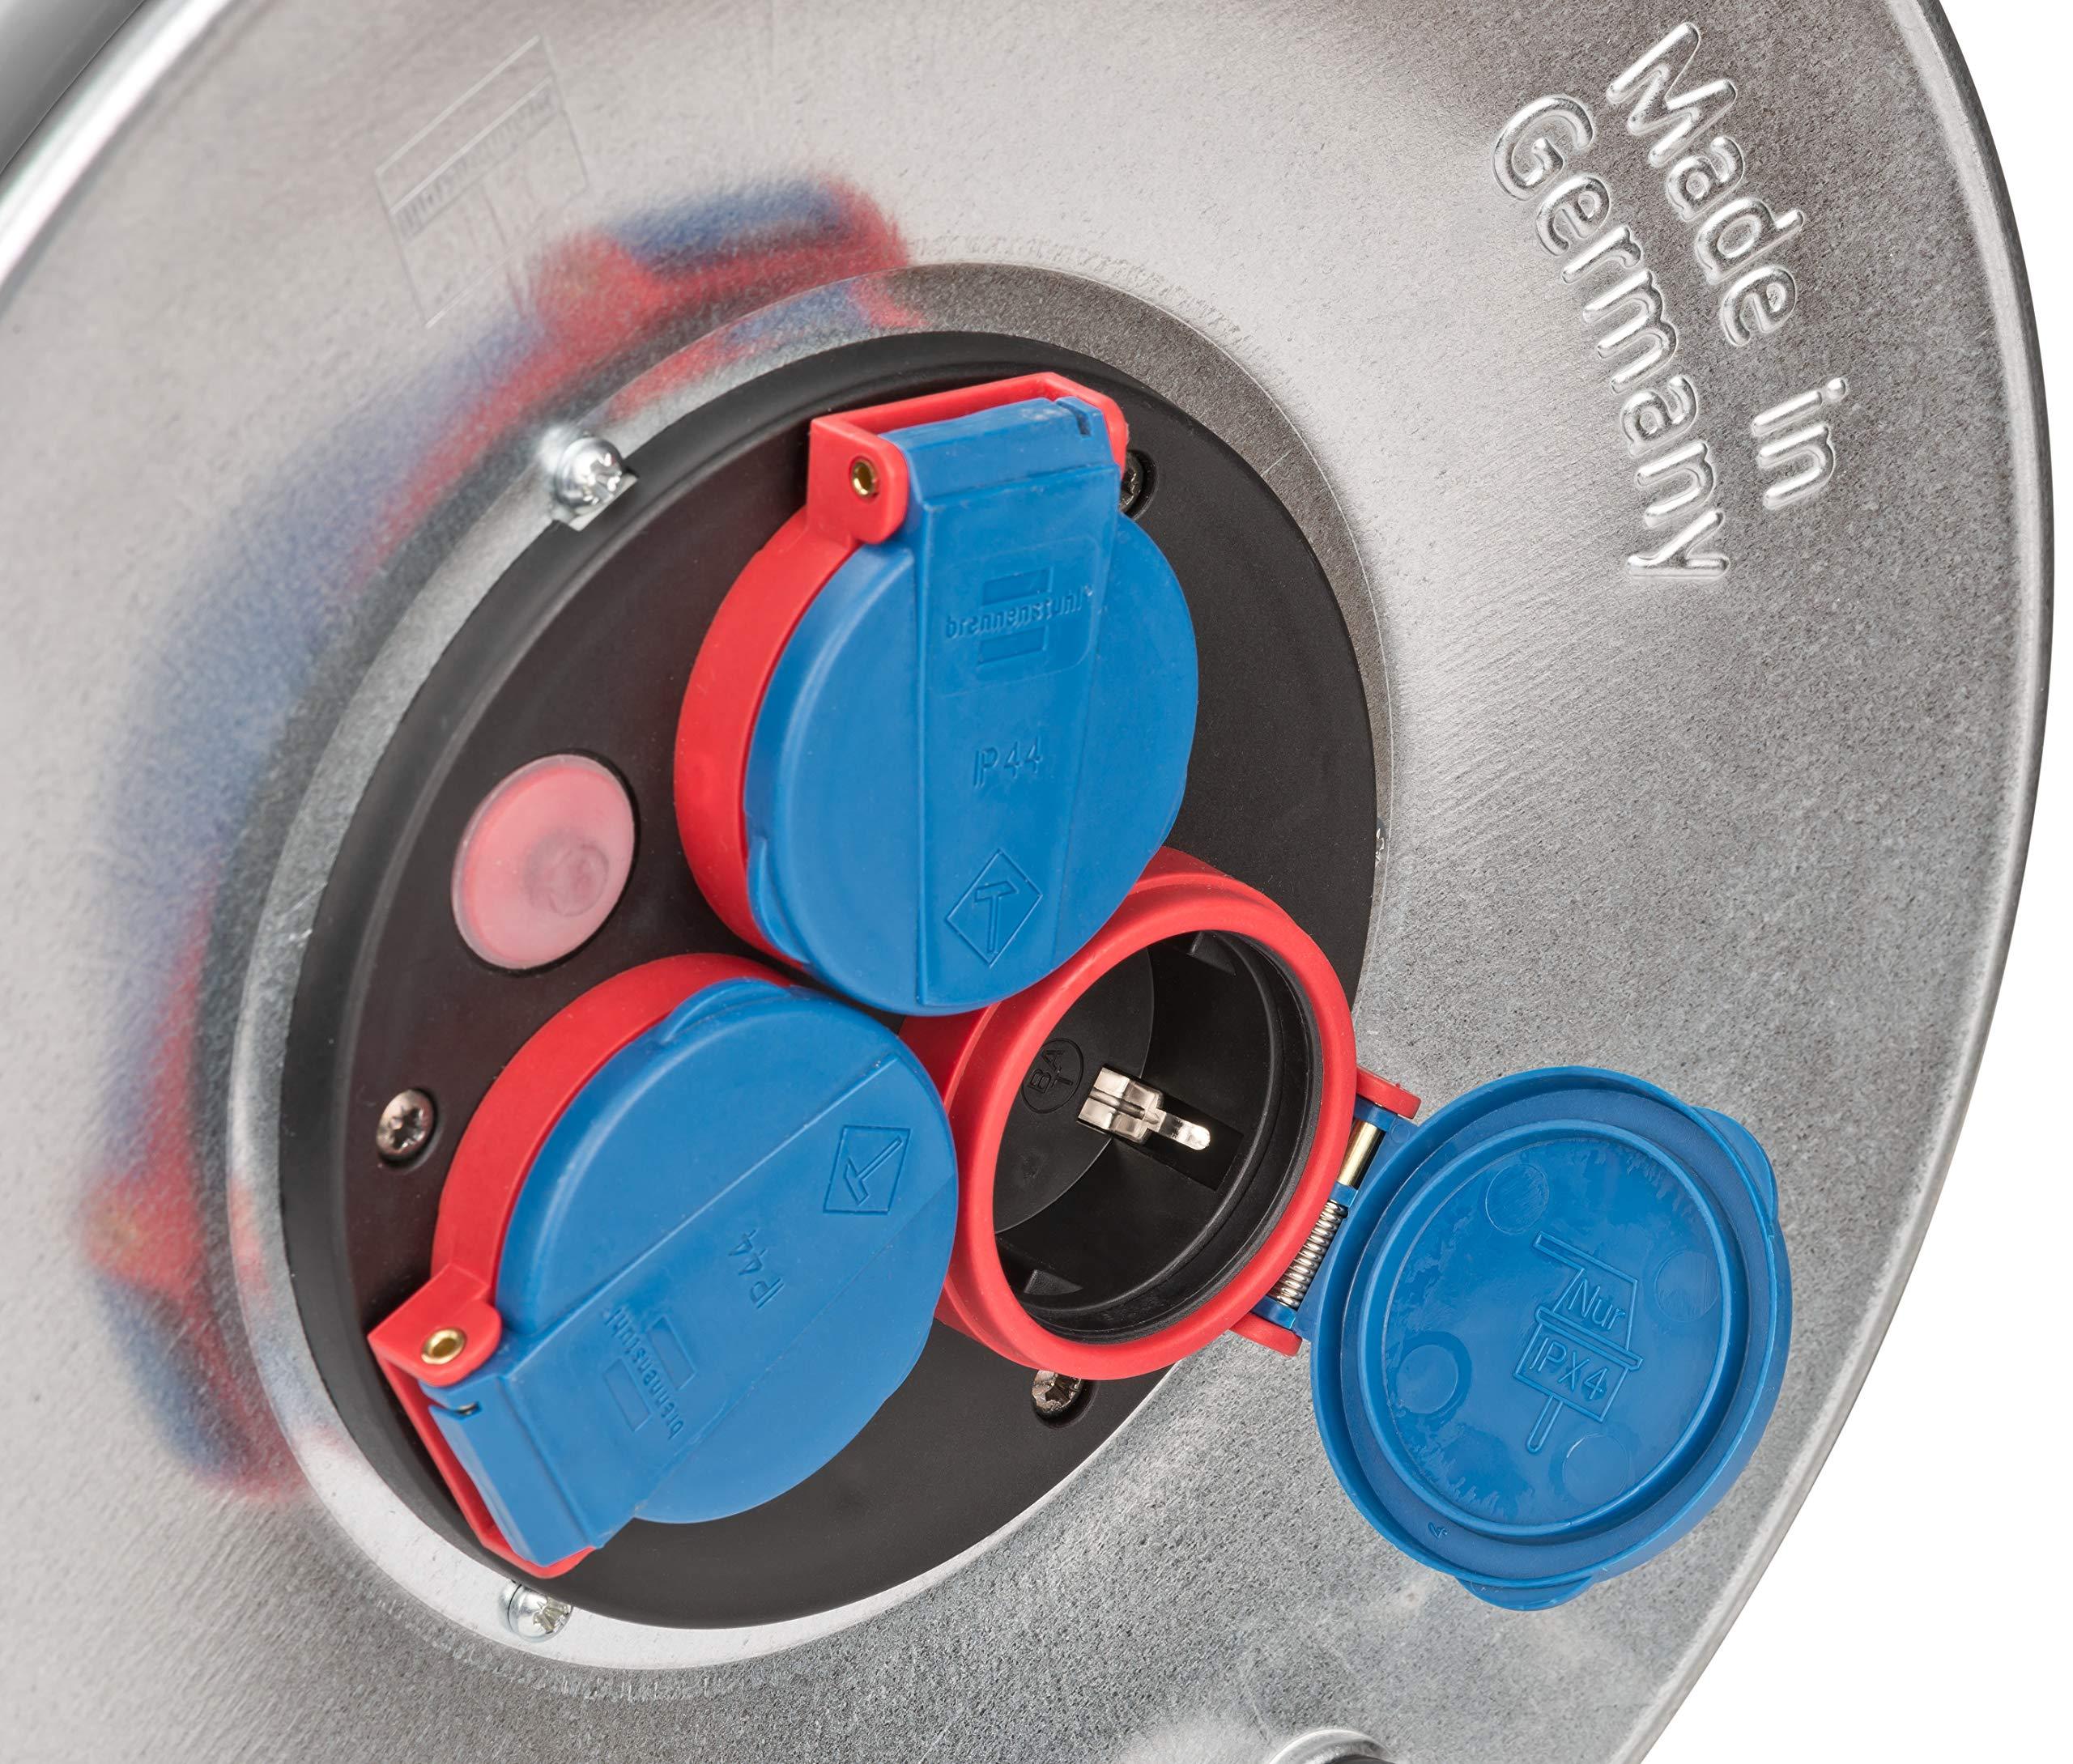 Bases m/últiples Rojo s Plata base m/últiple s 25m Negro 25 m, 3 salidas AC, IP44, Negro, Azul, Rojo, Plata, Negro, 1 pieza Azul Brennenstuhl 25m H07RN-F 3G2,5 3AC outlet